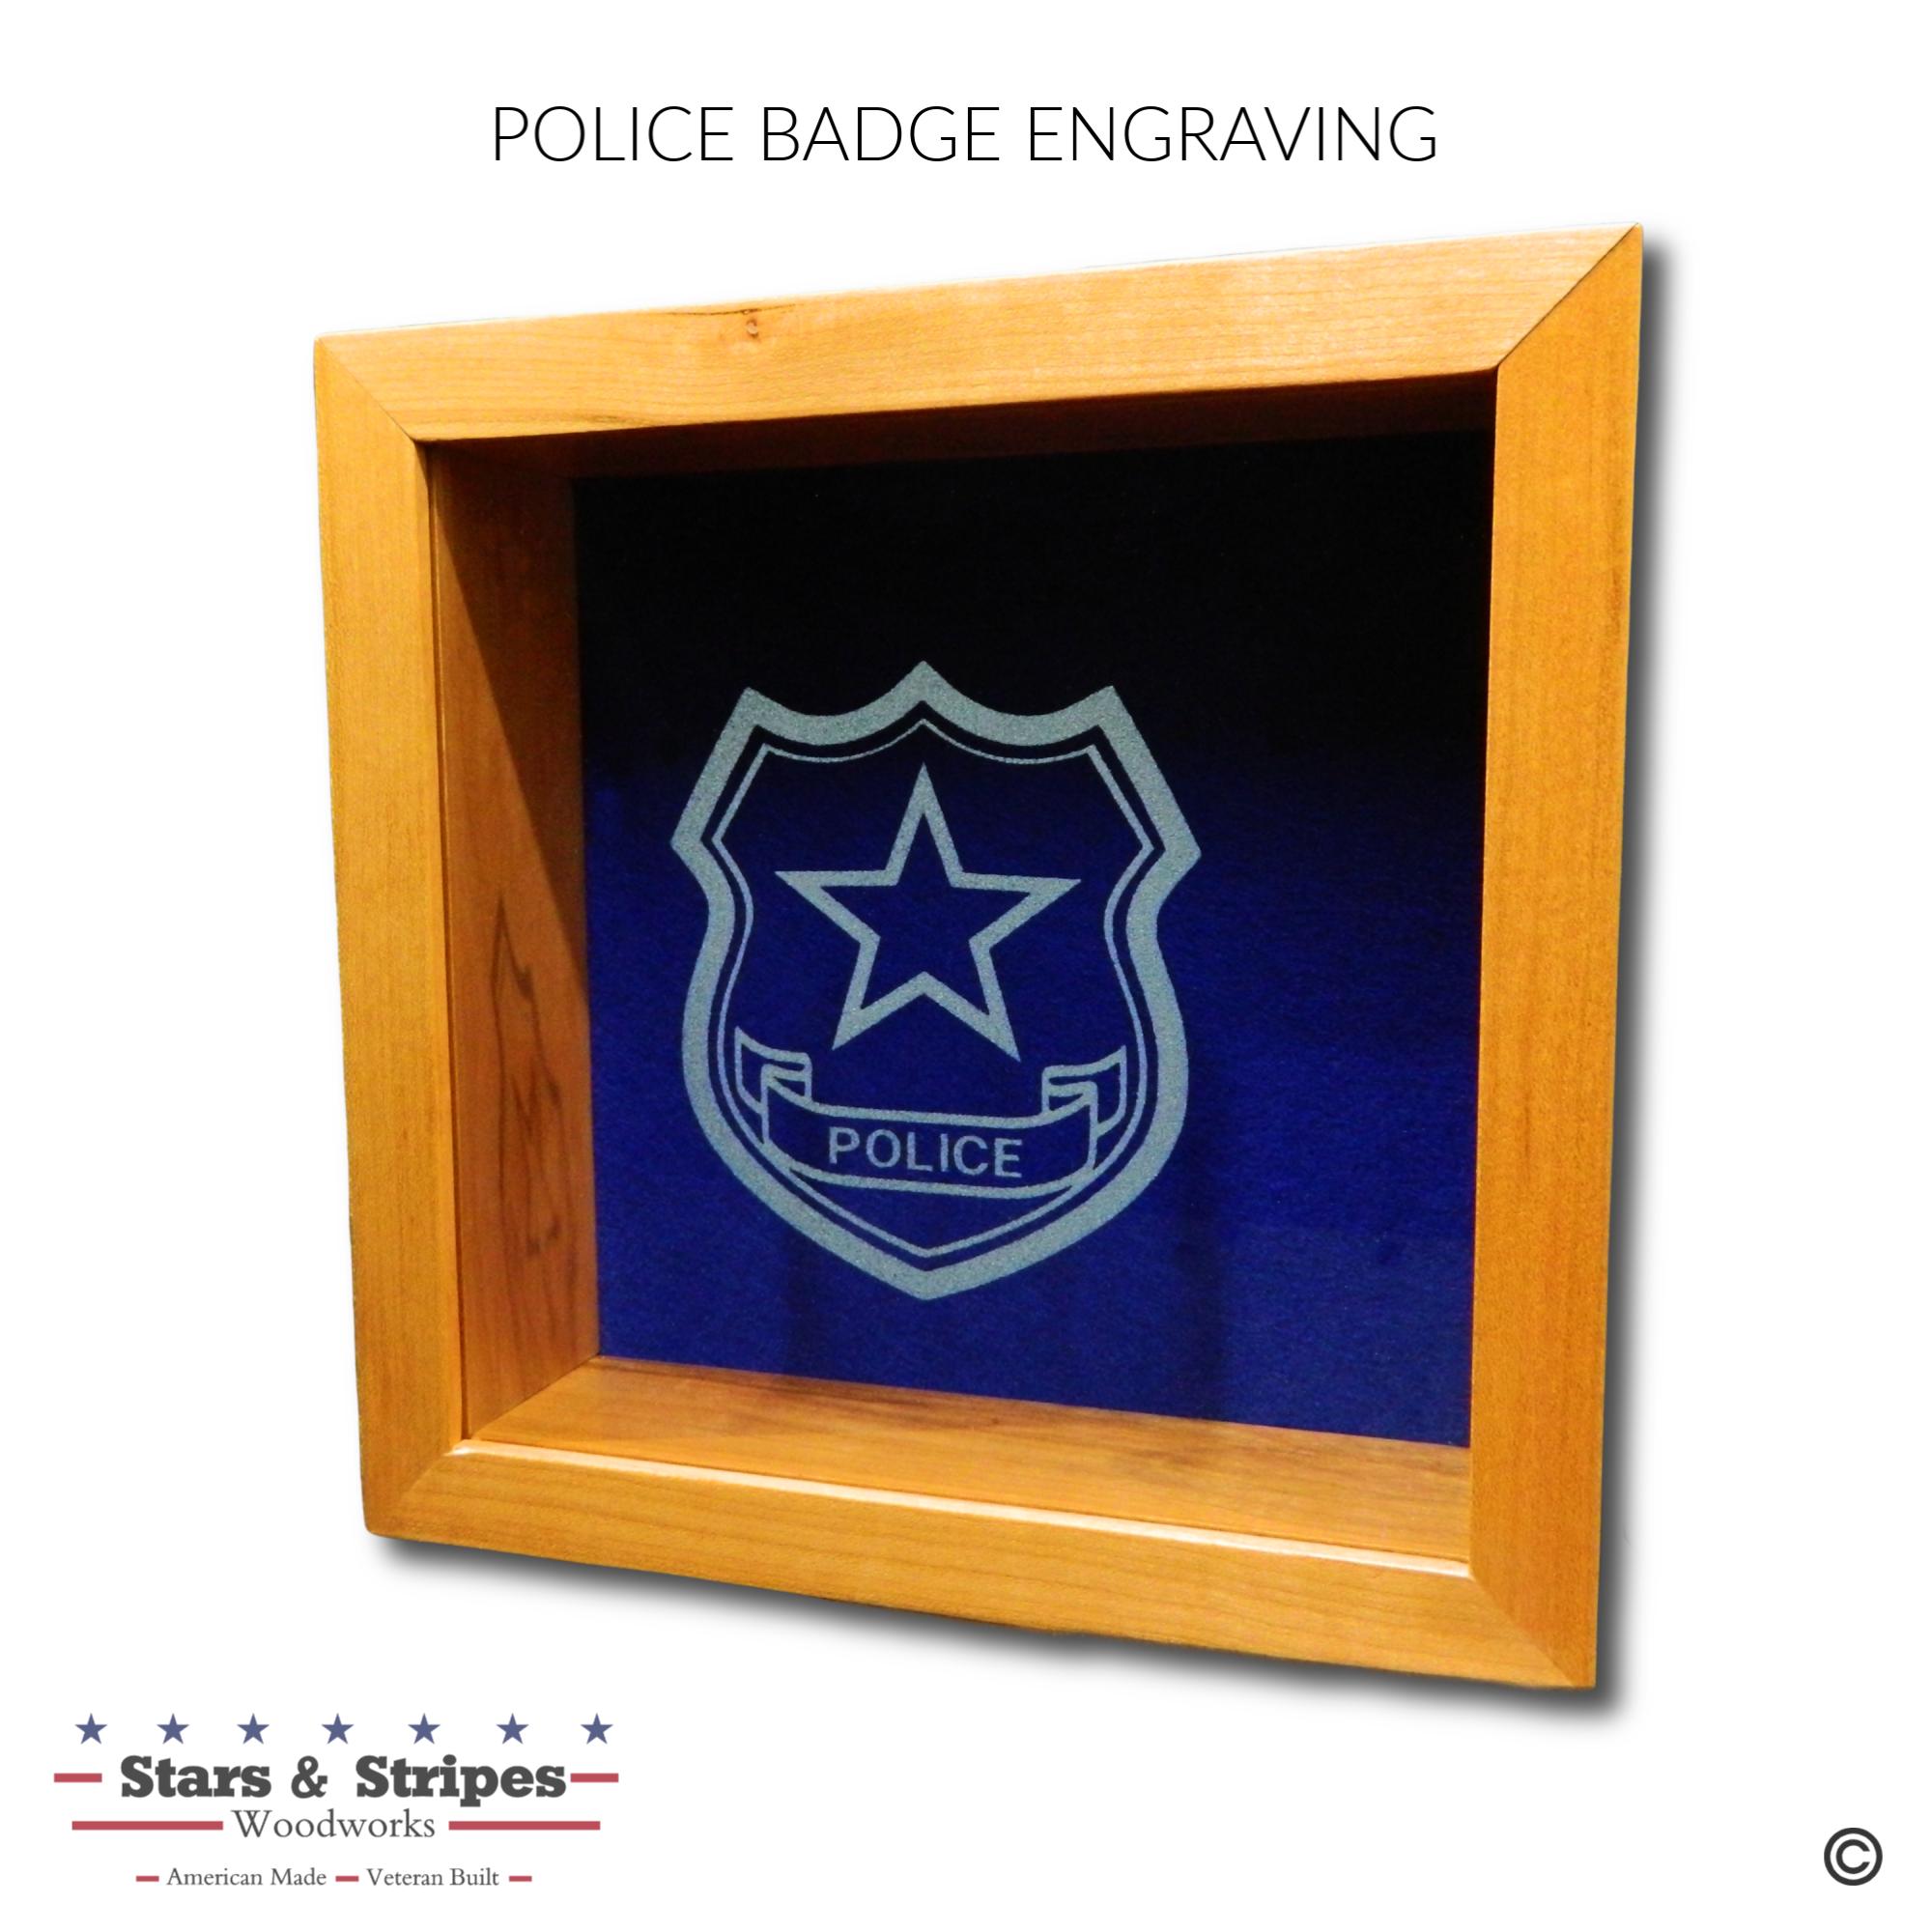 Police Badge Glass Engraving Sample